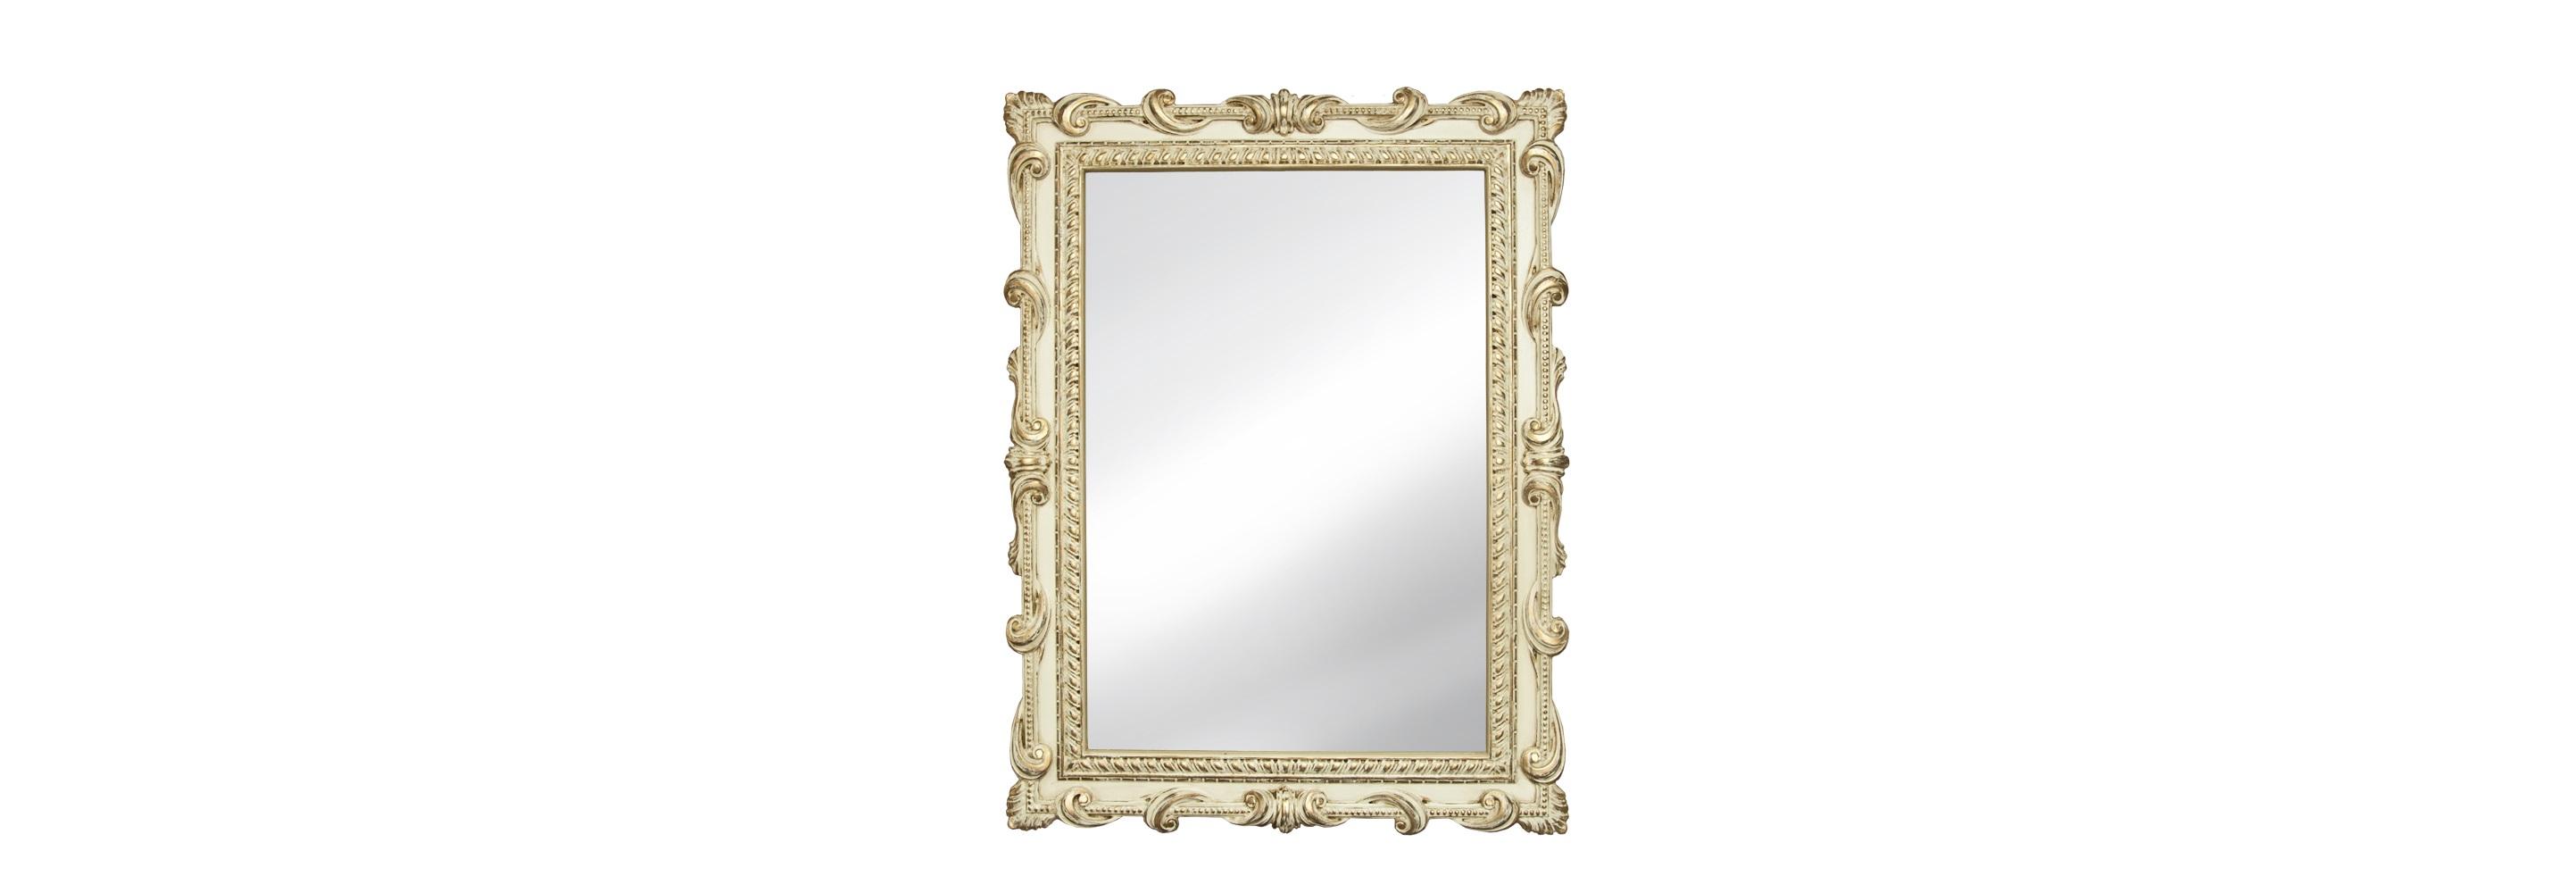 Зеркало Reeforma 15444972 от thefurnish